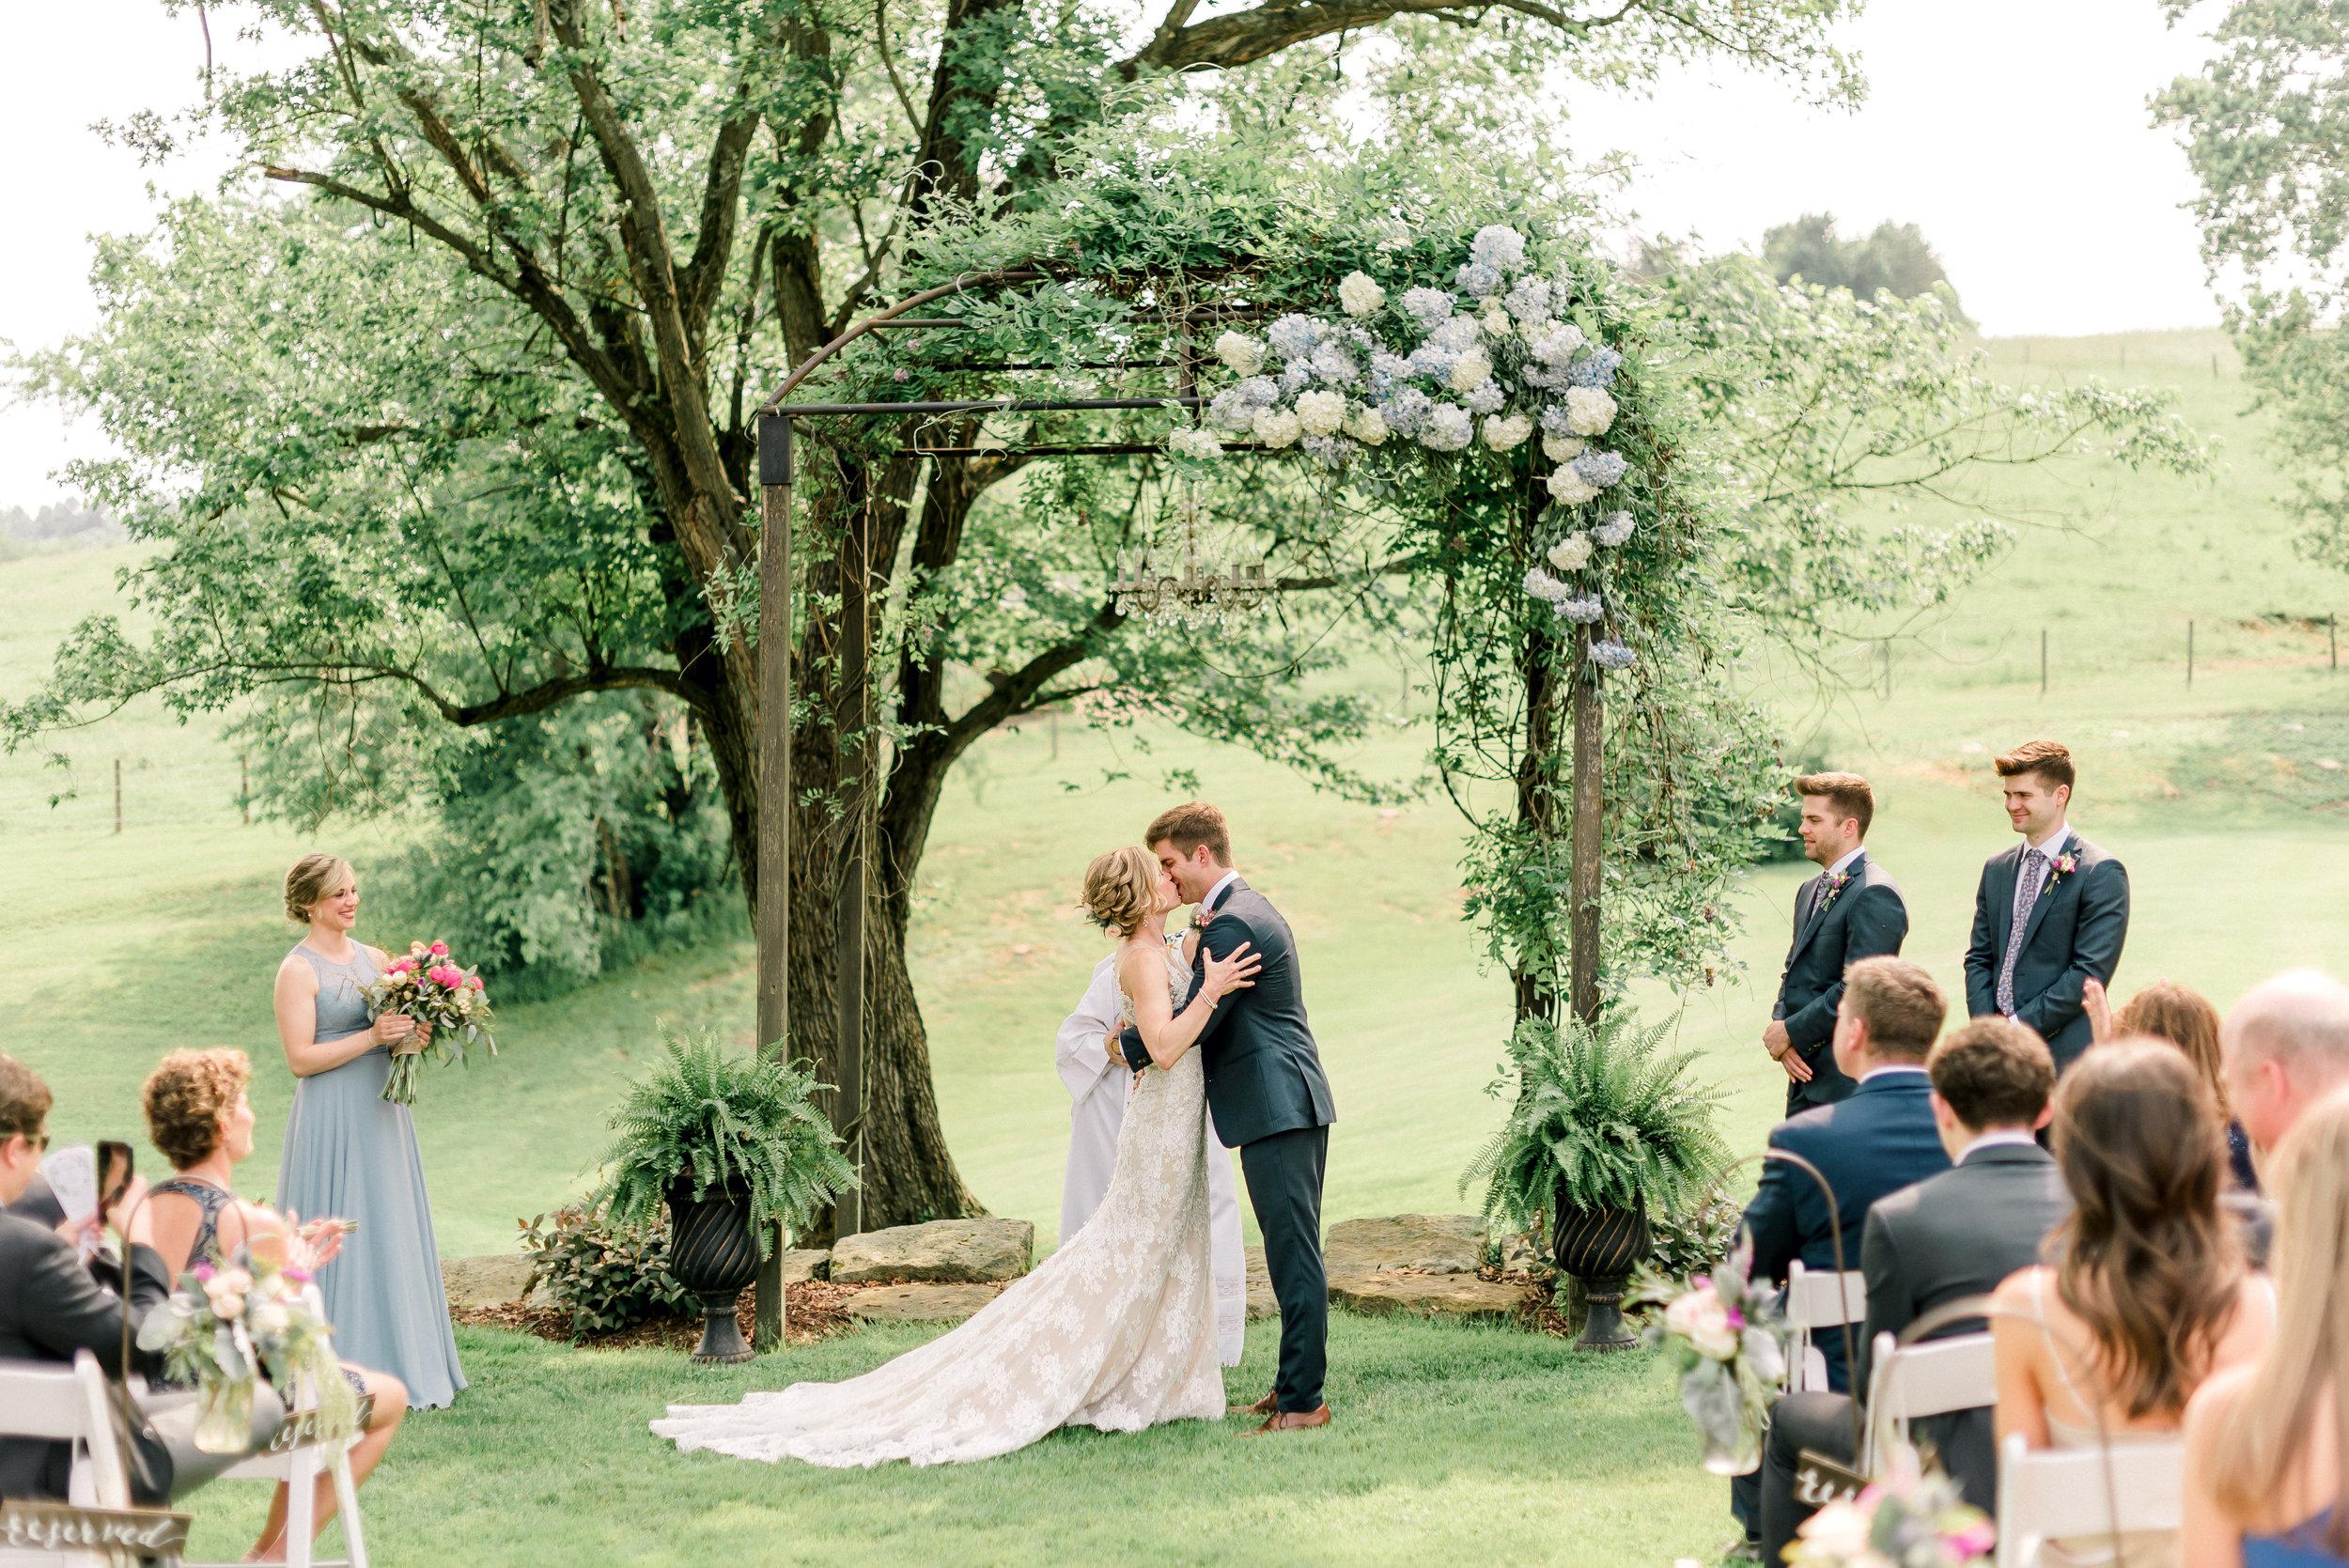 pittsburgh-wedding-photographer-shady-elms-farm-0043.jpg